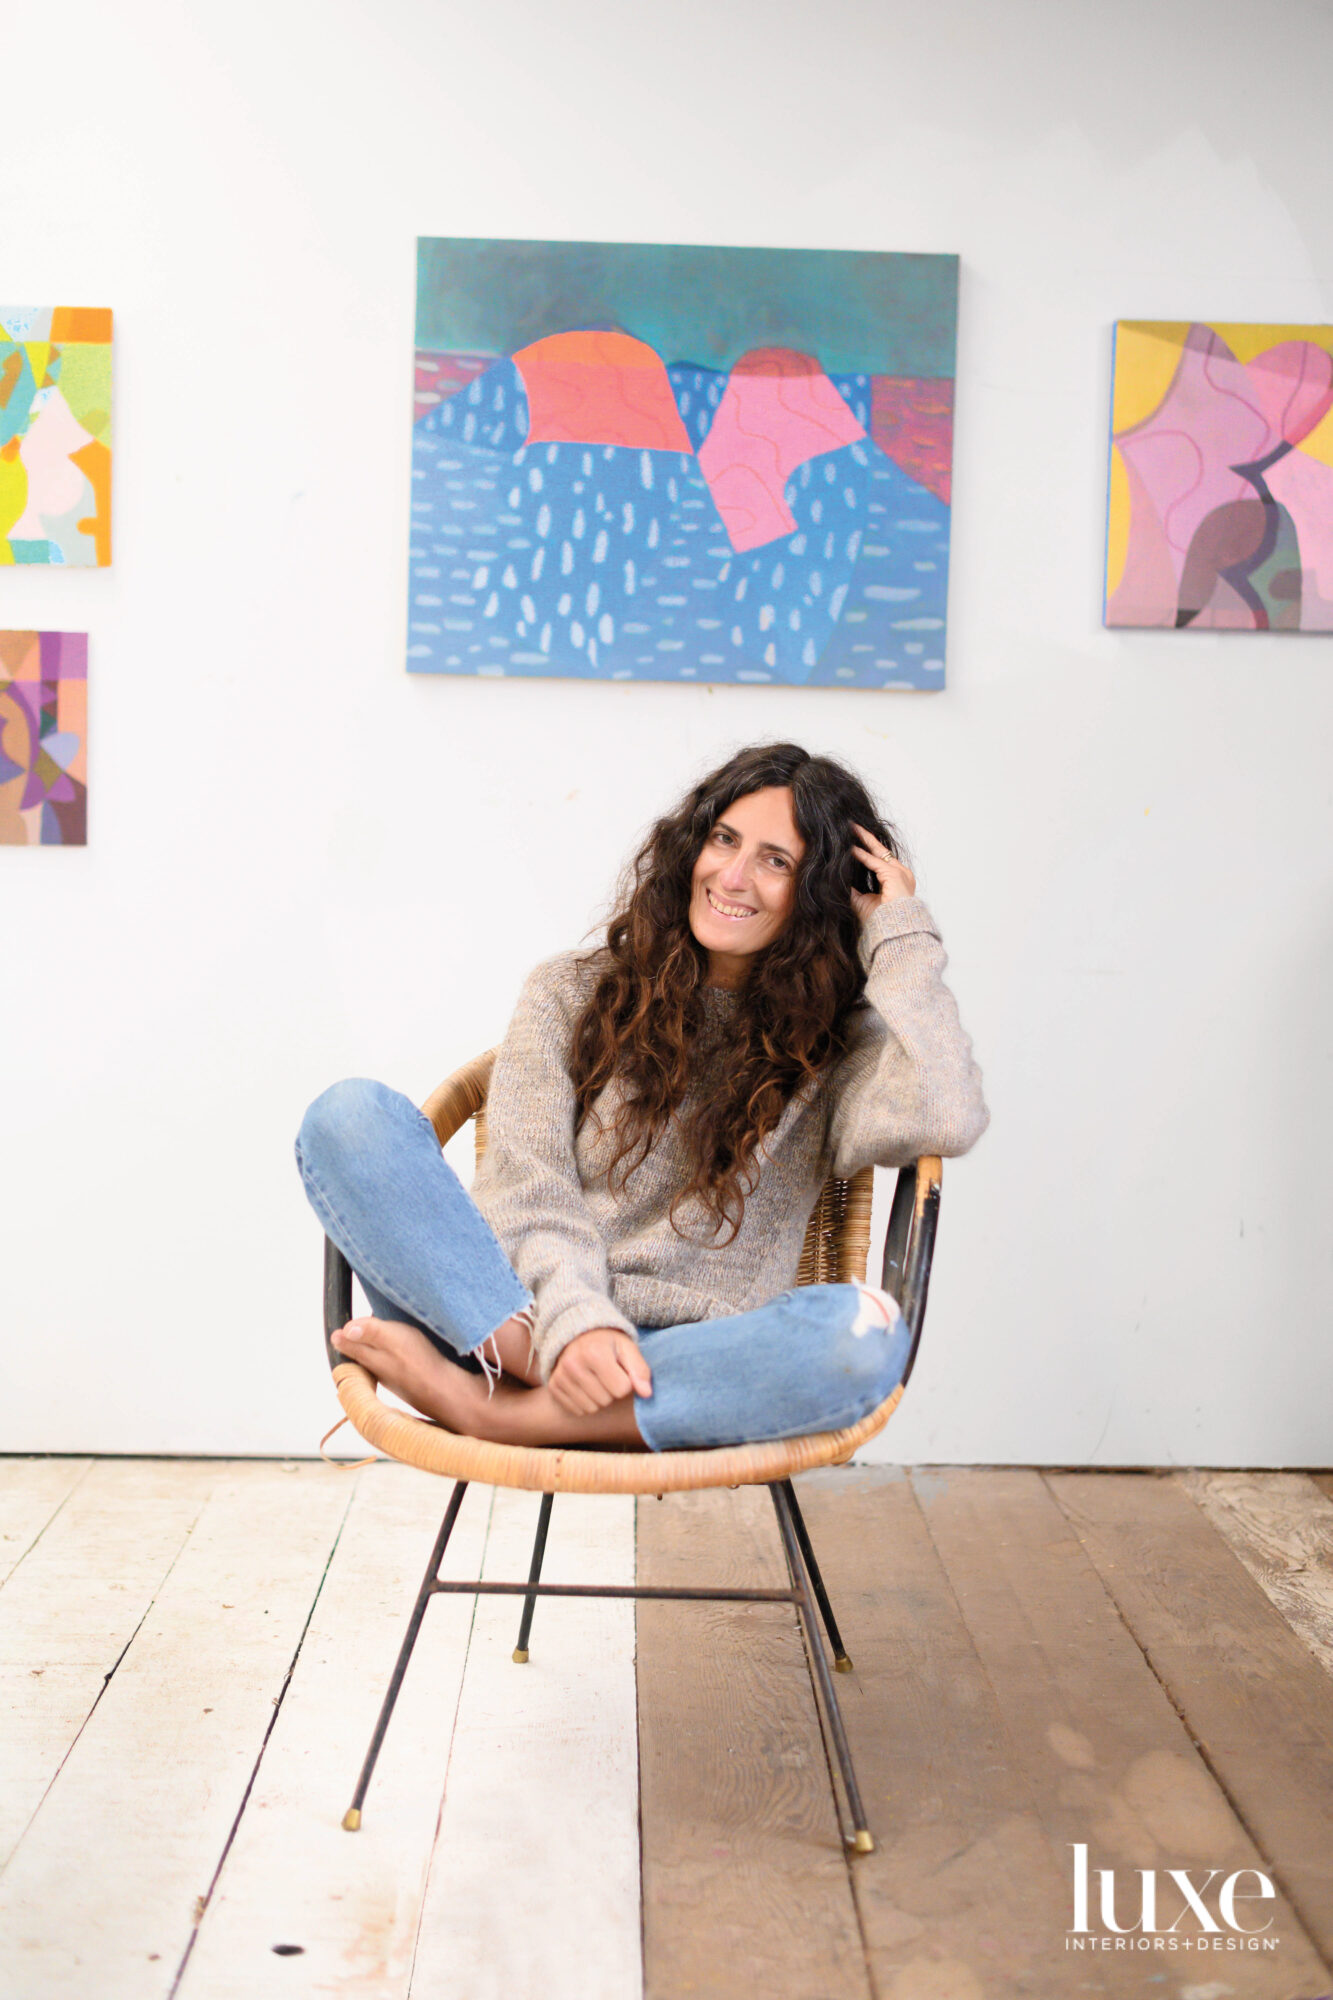 rachel kaye portrait in studio